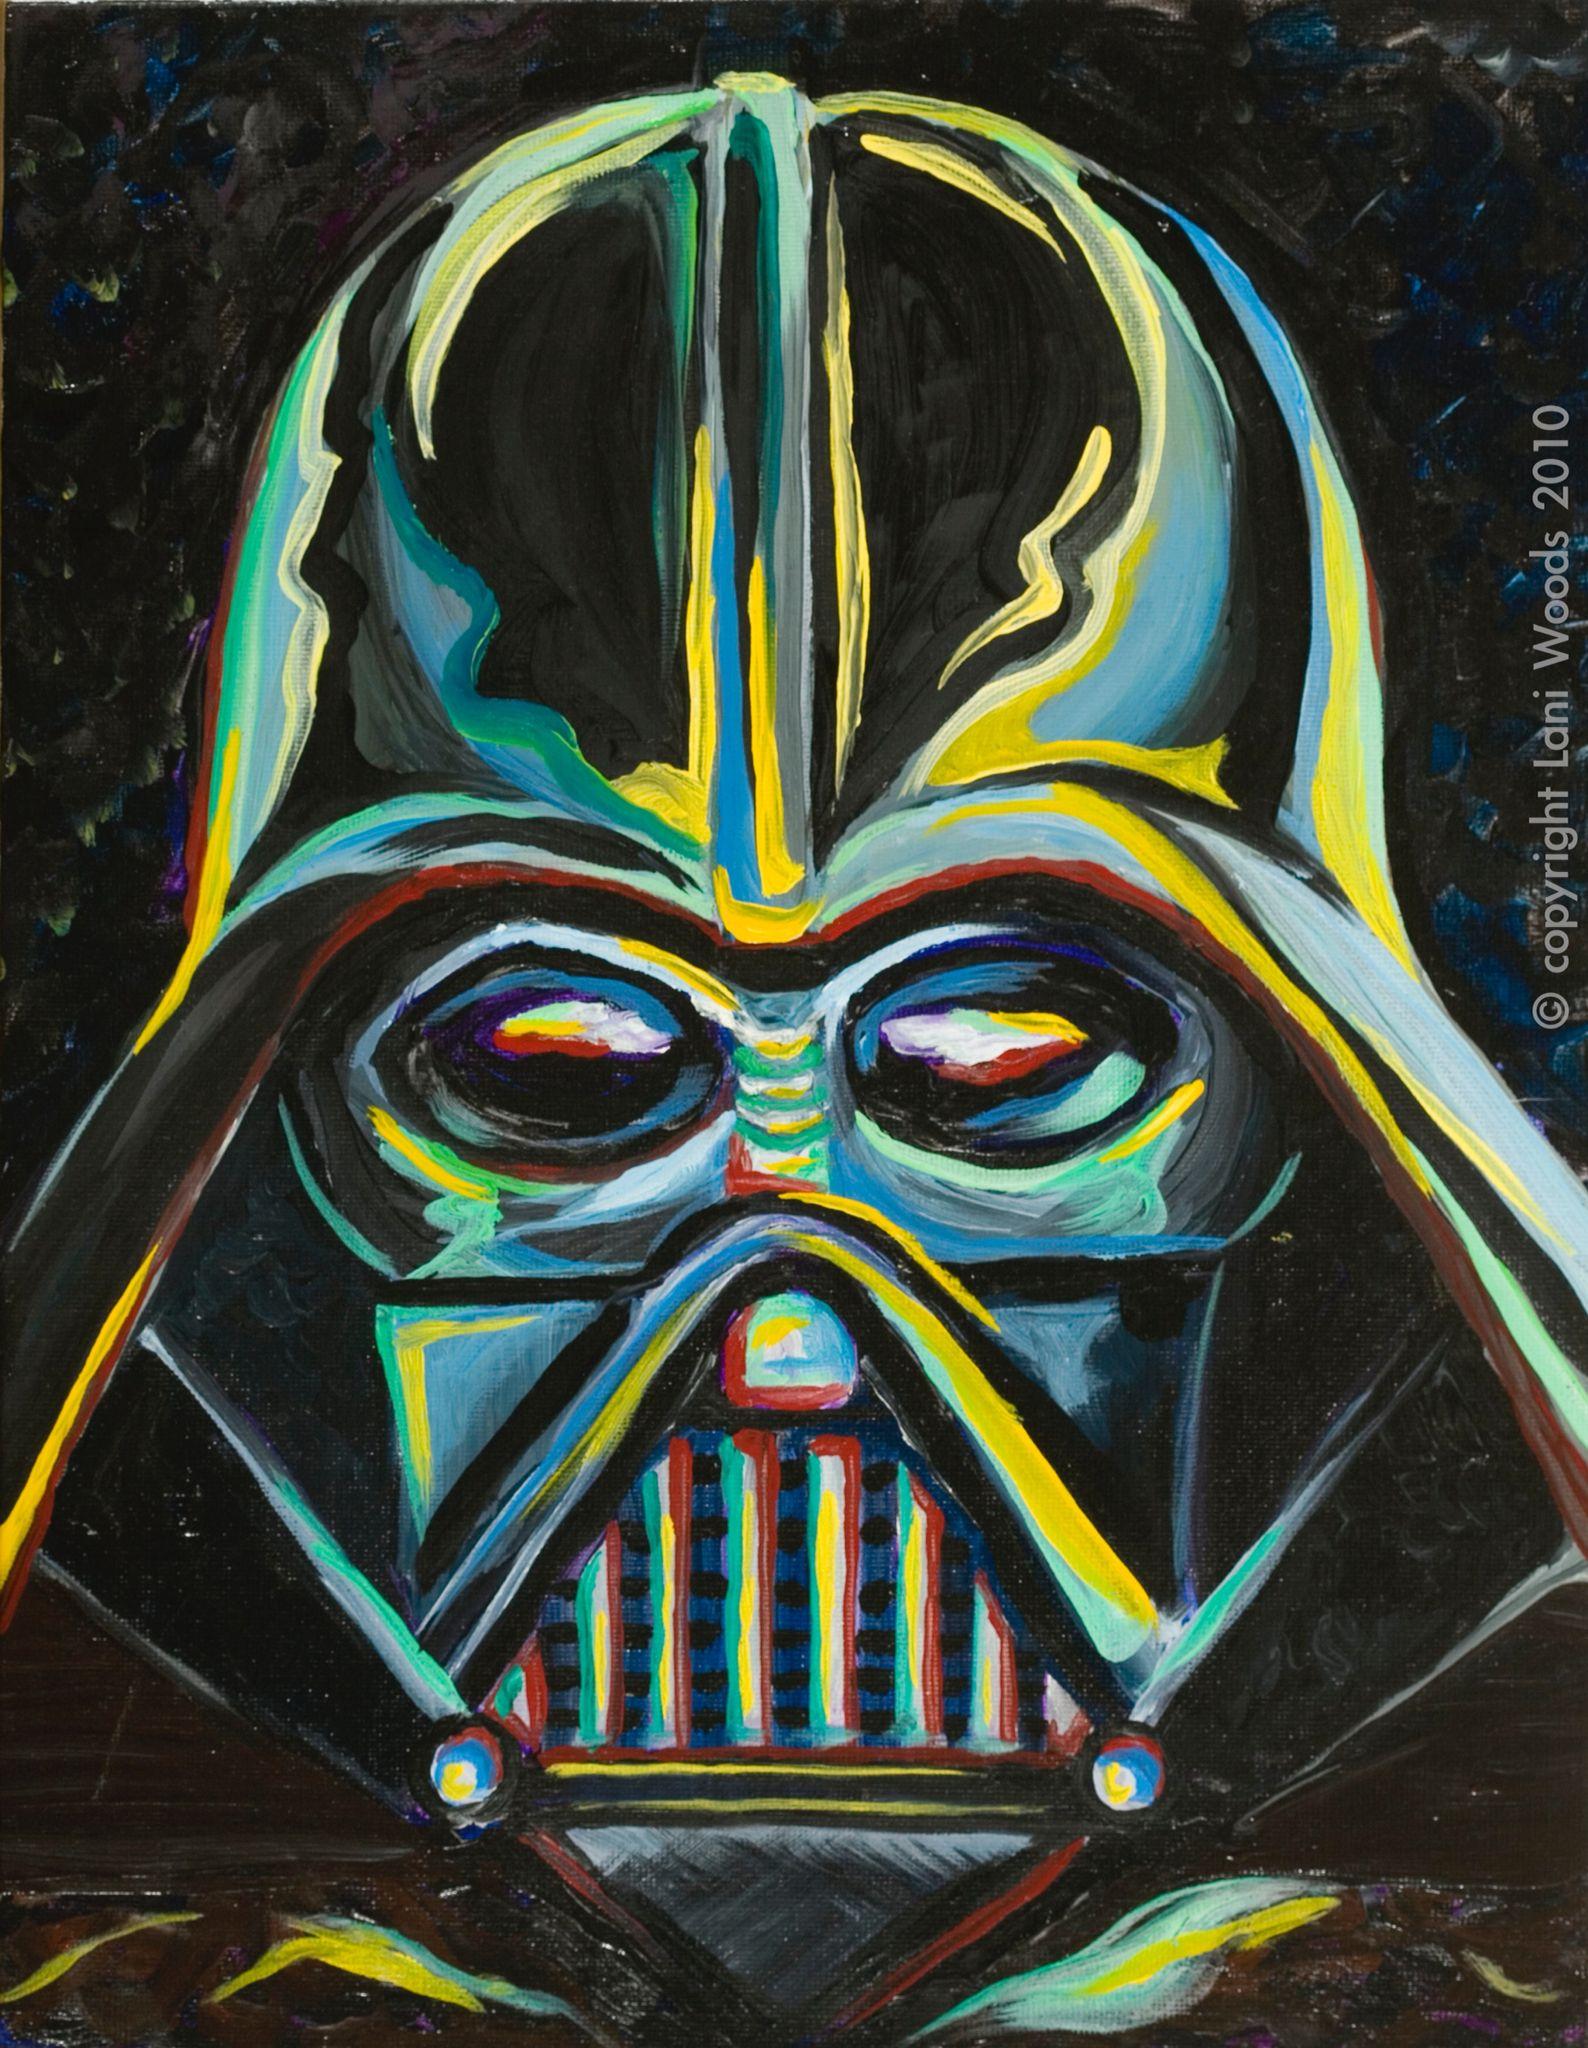 Darth Vader 11x14 Original Oil Painting By California Artist C Lani Woods